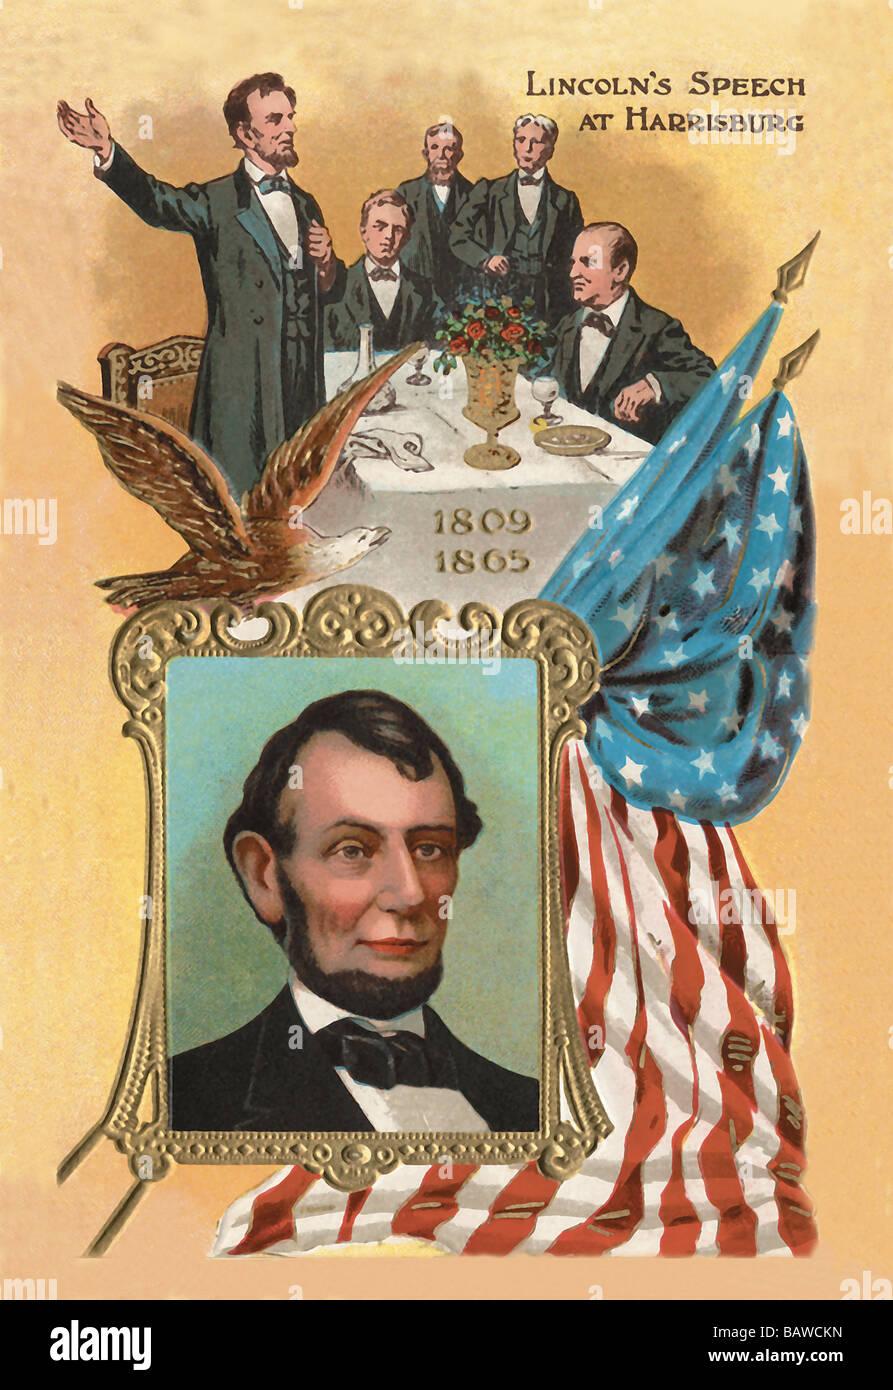 president lincolns speech - HD893×1390